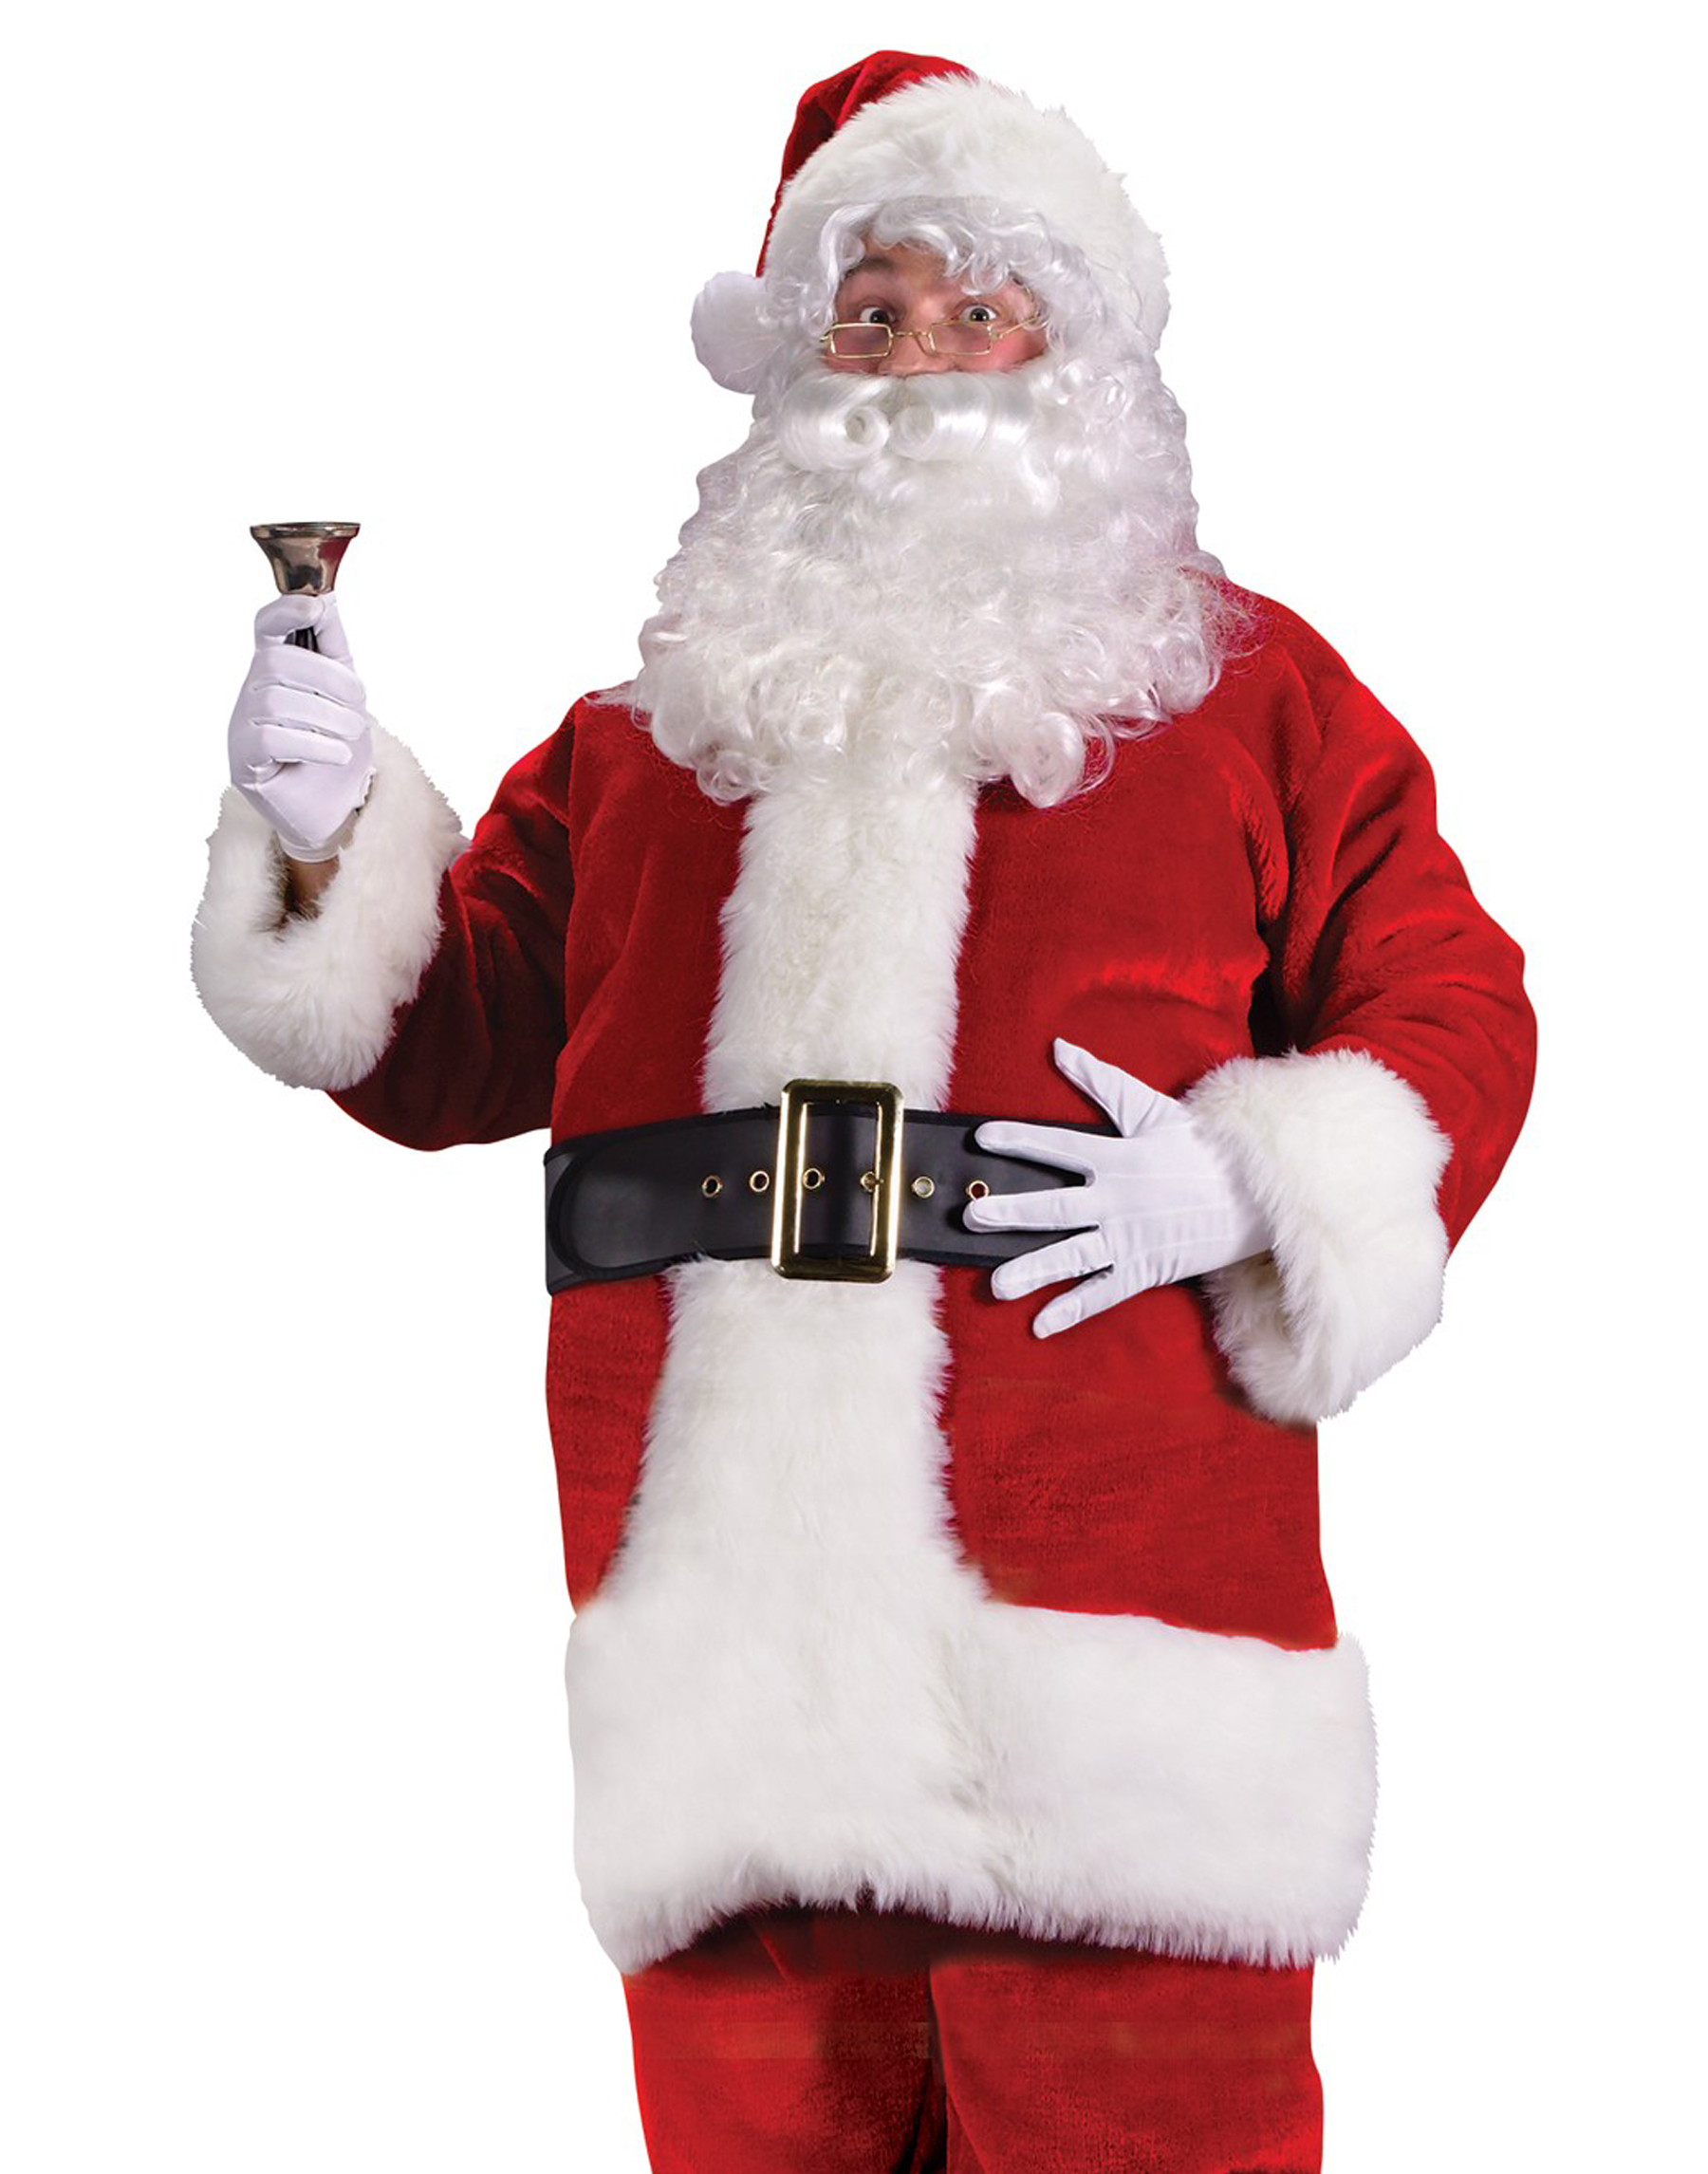 Plush Regency Christmas Santa Suit   Walmart.com